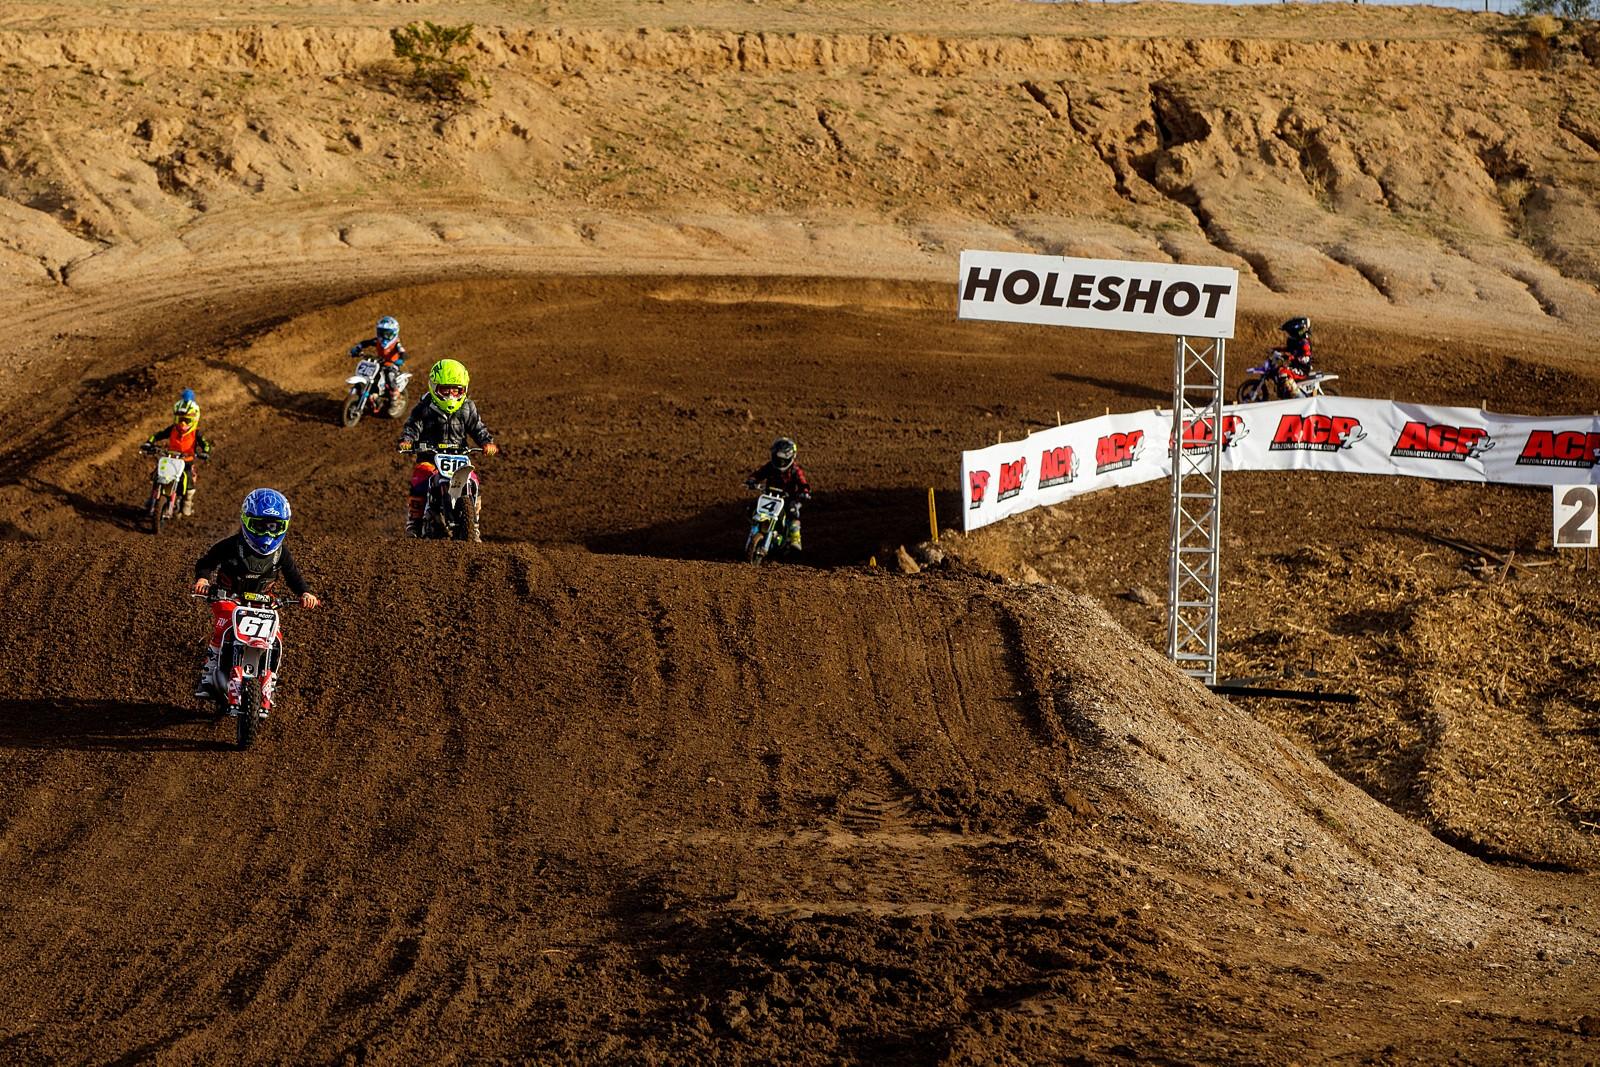 Alan Scott - AZ Open of Motocross, Part 2 - Motocross Pictures - Vital MX